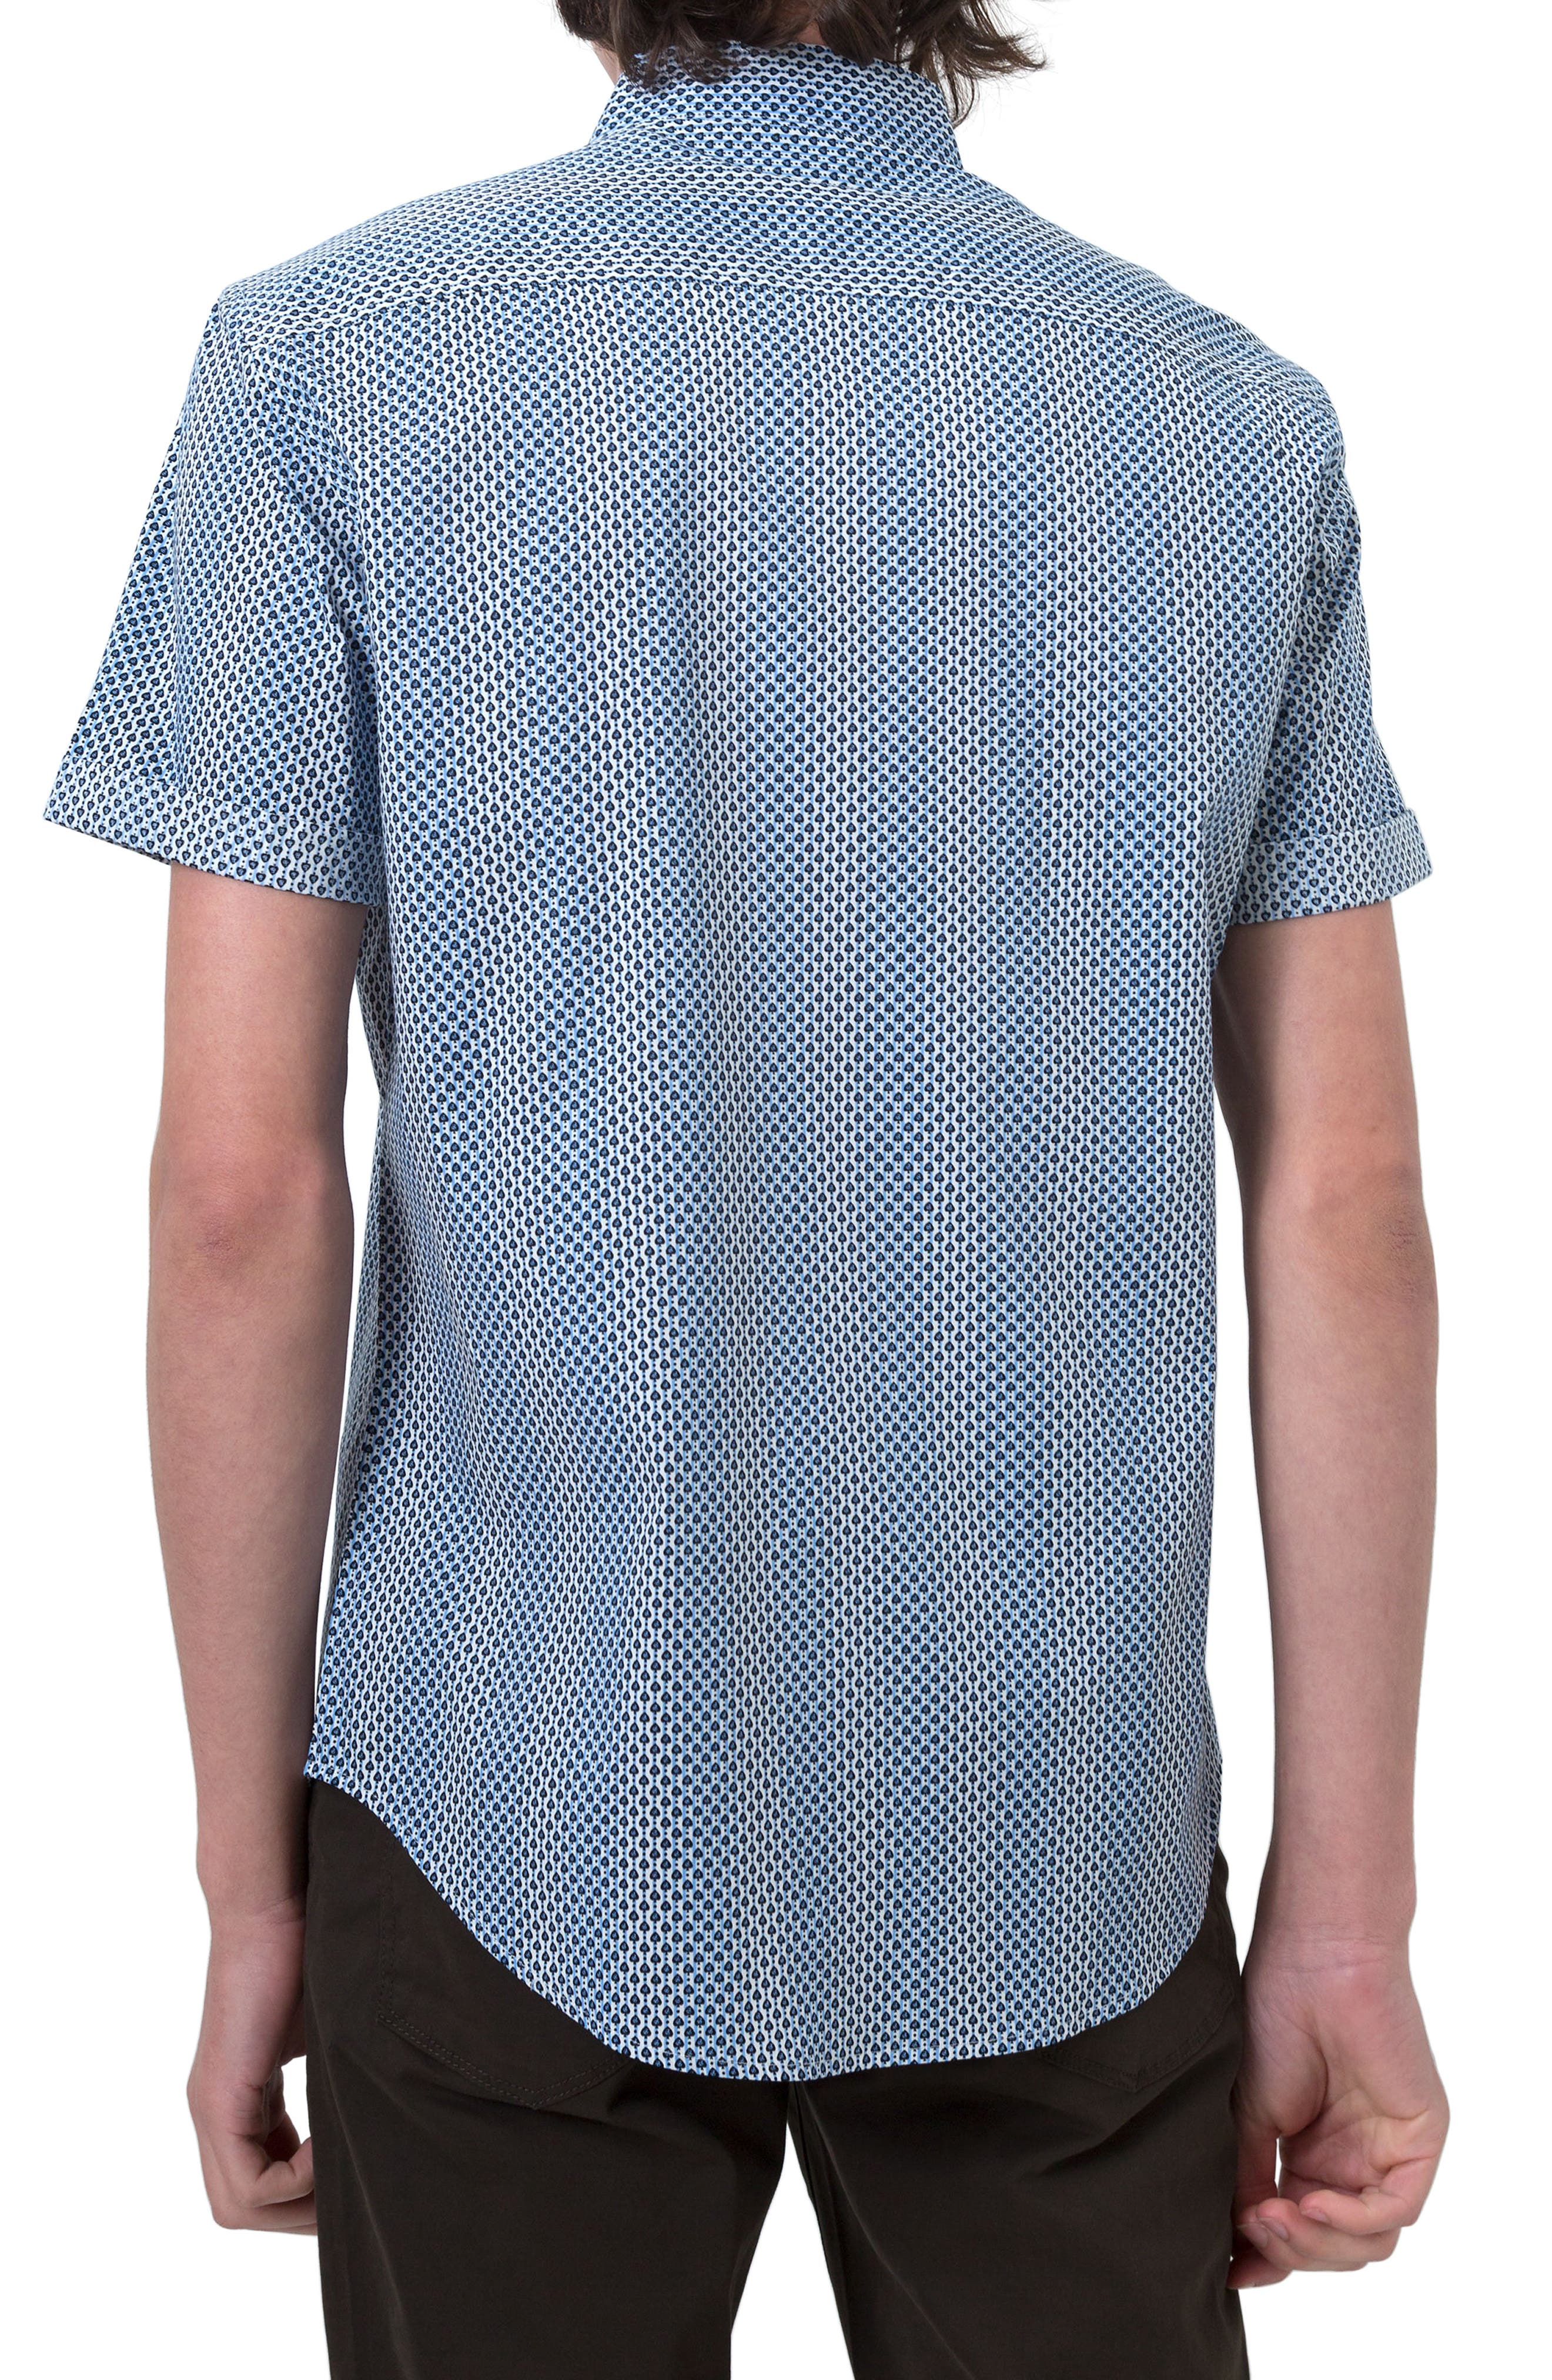 Goodnight Sun Woven Shirt,                             Alternate thumbnail 2, color,                             400